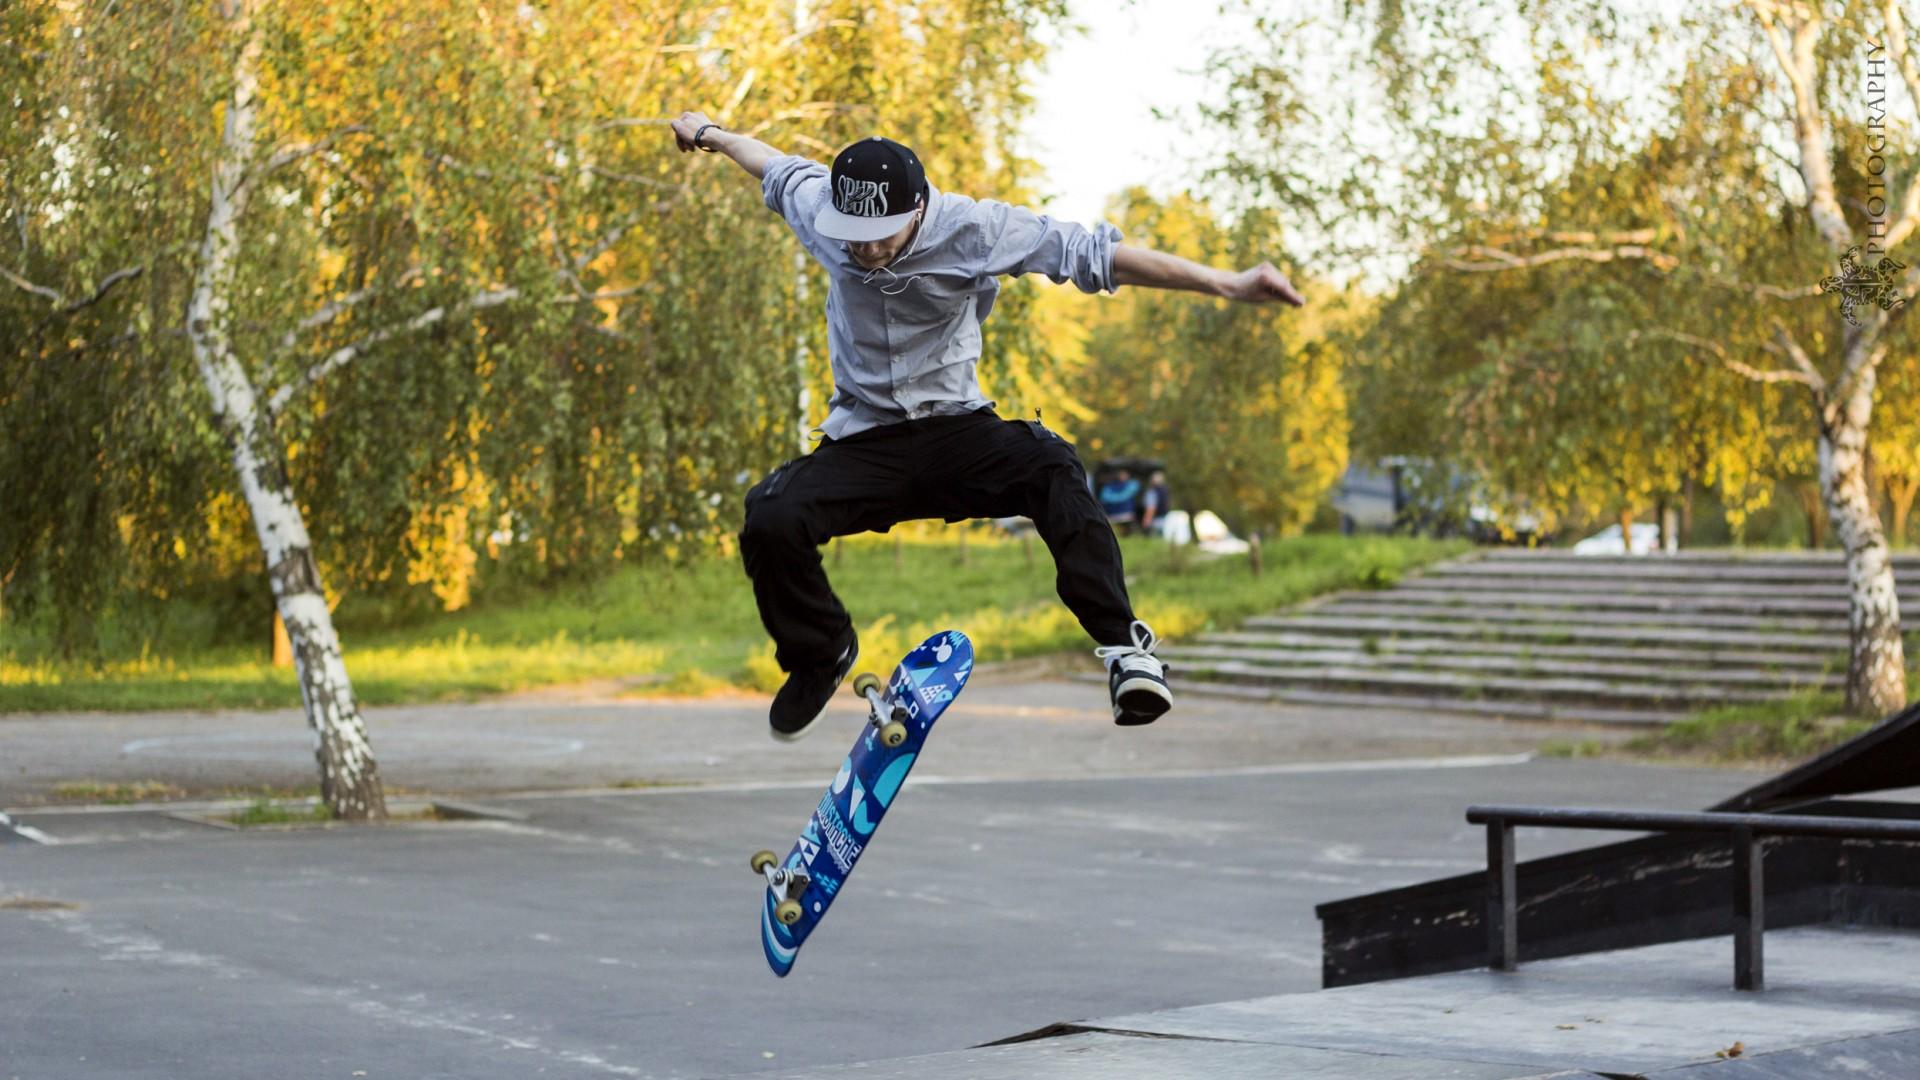 Girl Skateboards Iphone Wallpaper Blue skateboard wallpapers 1920x1080